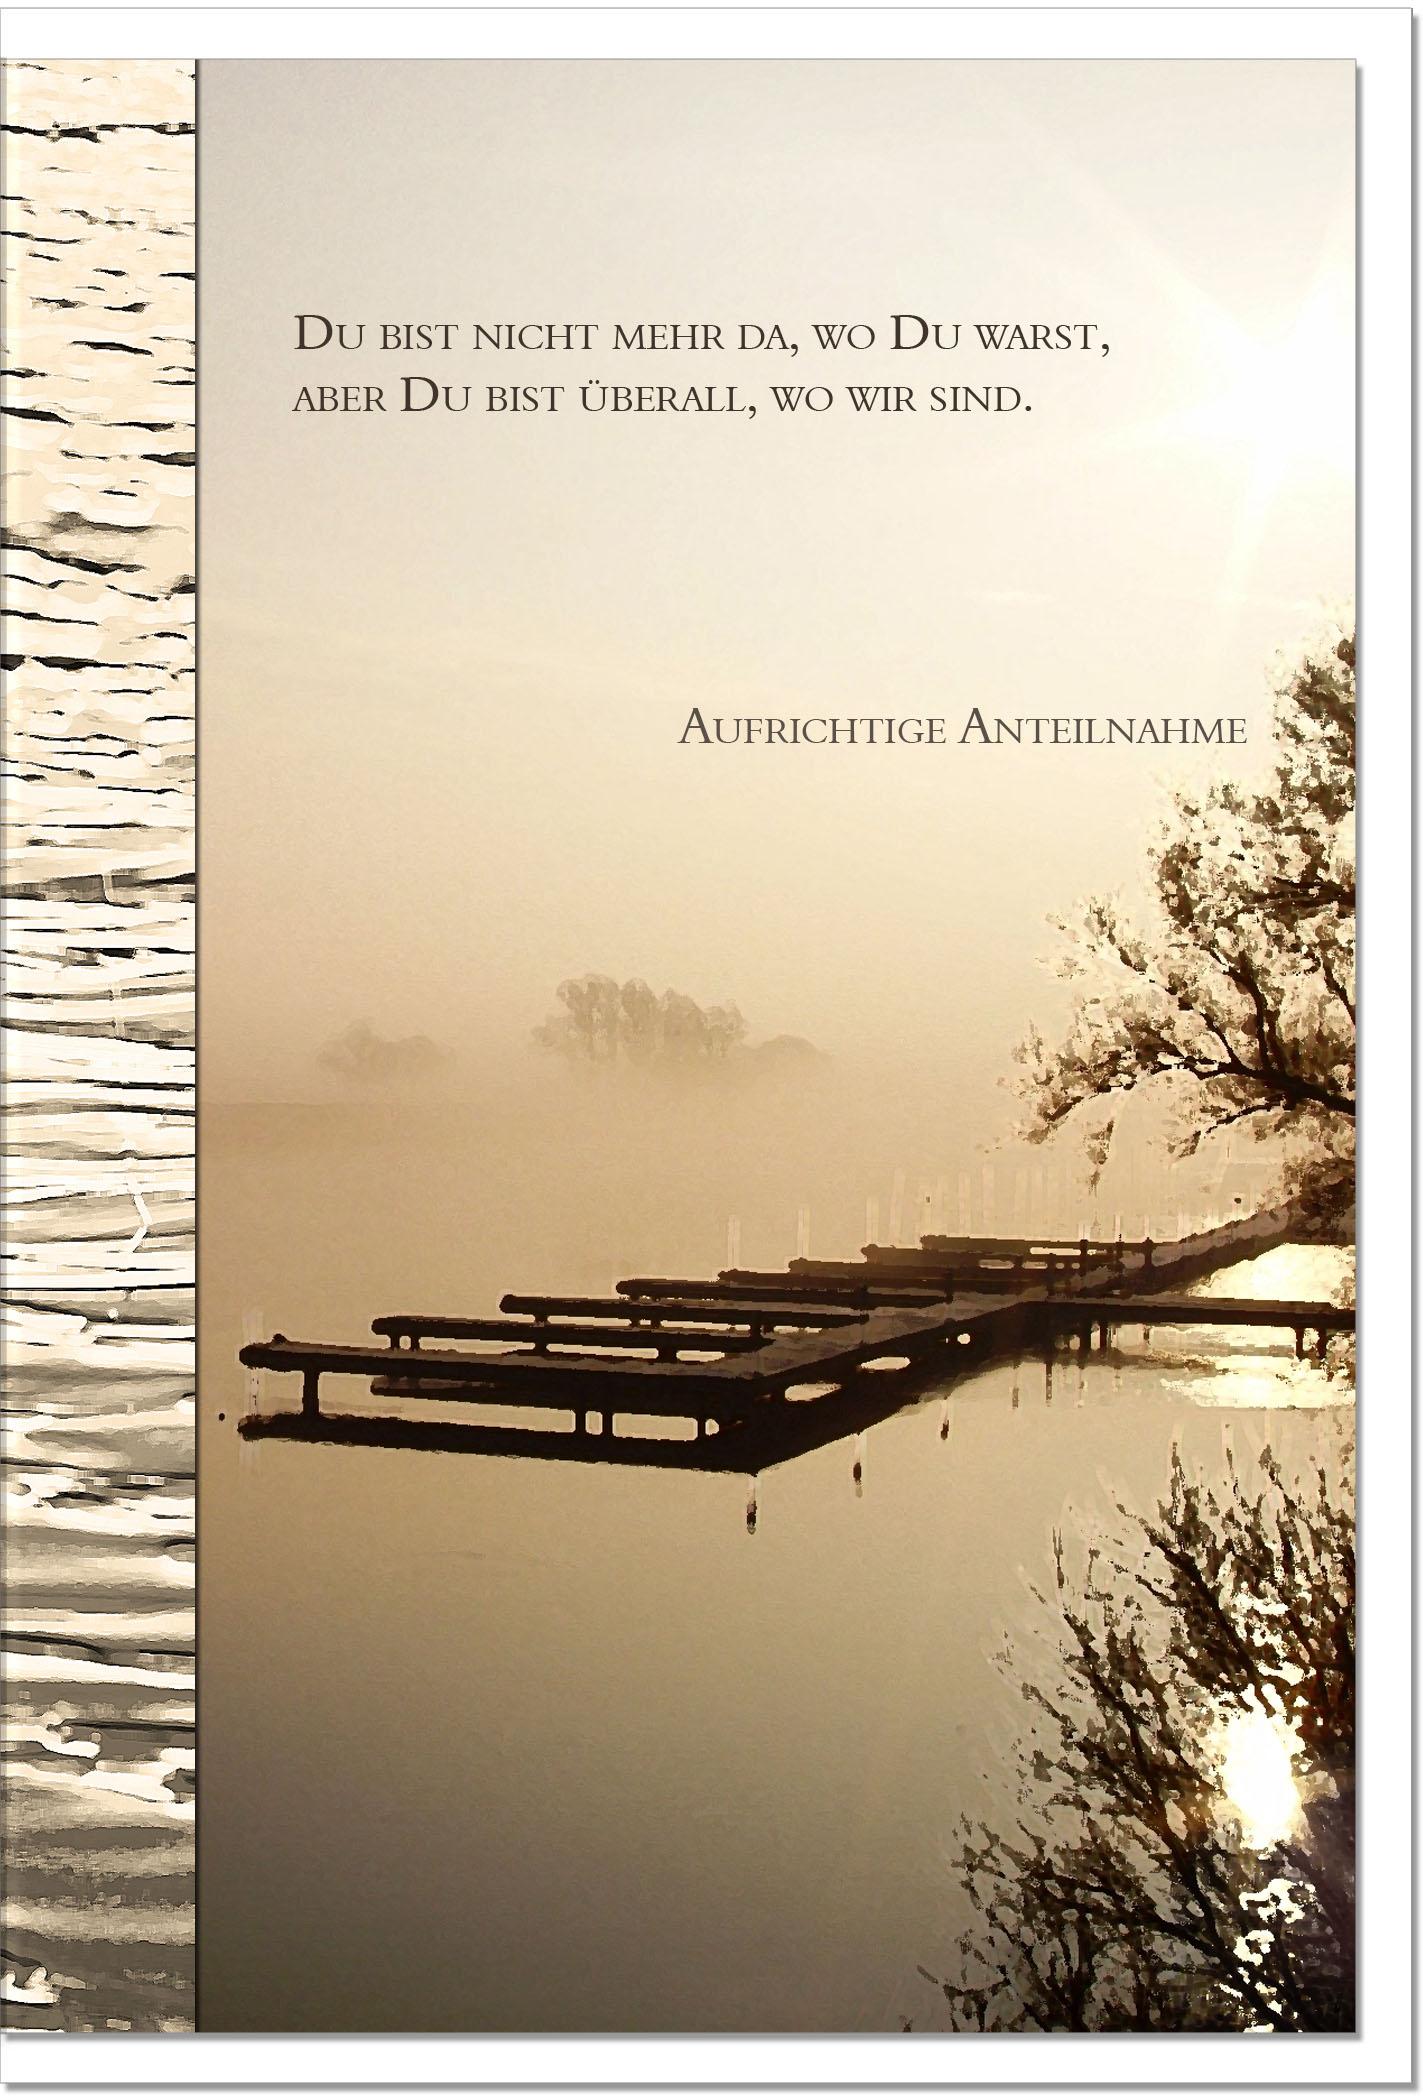 Atemberaubend Kondolenzkarte ABENDSTILLE | Steg im Sonnenuntergang | metALUm #WM_08